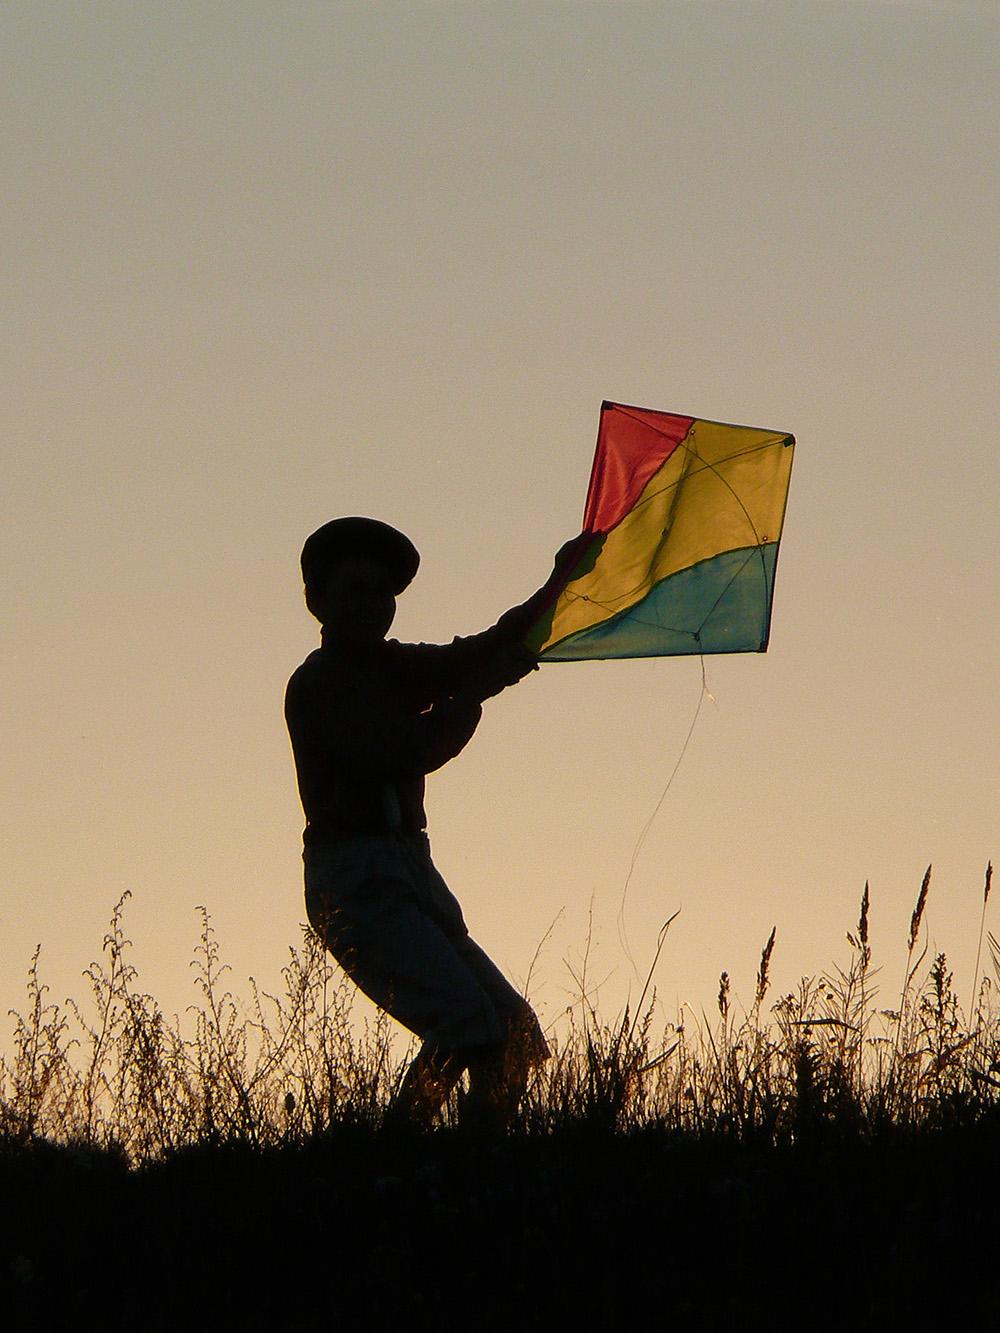 kite_boy2